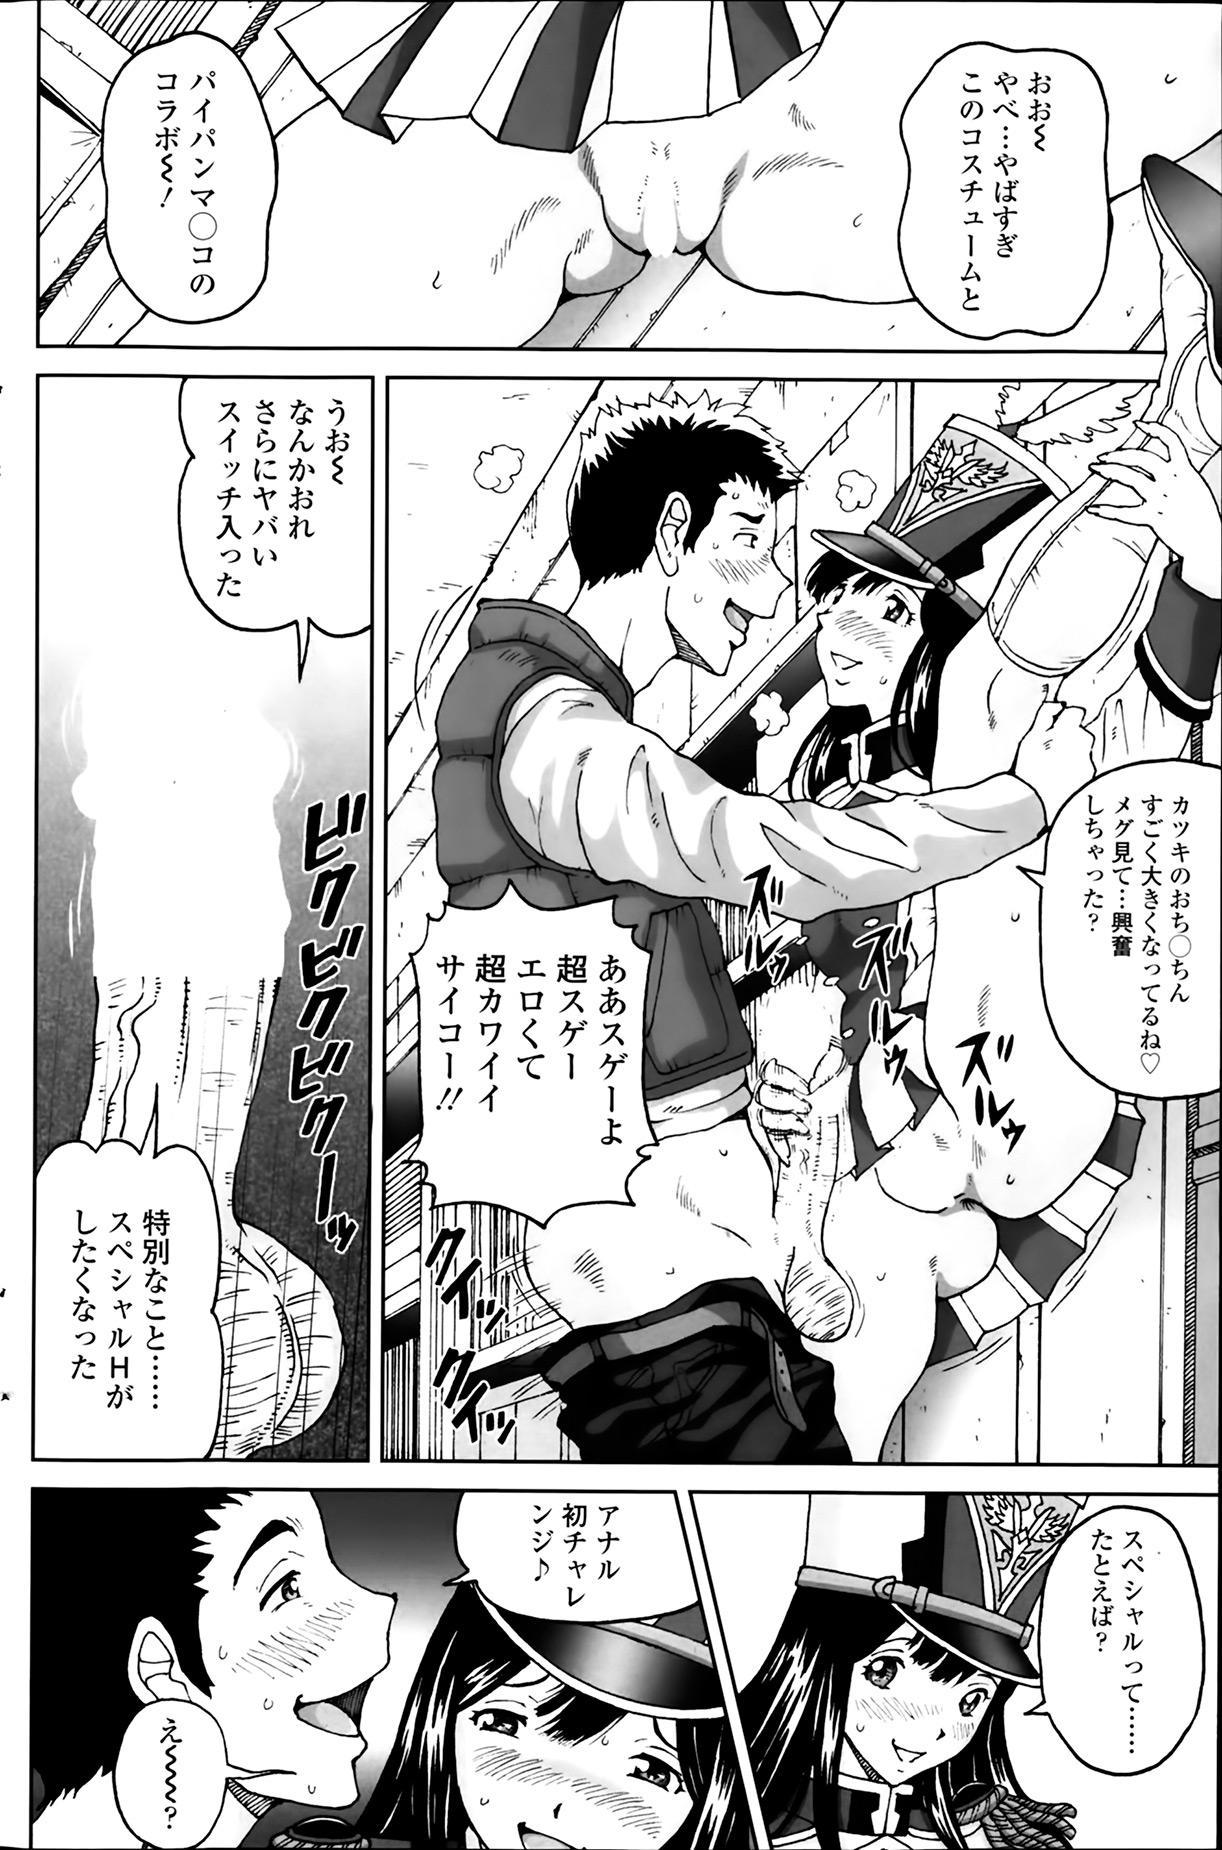 COMIC SIGMA 2014-03 Vol.78 130